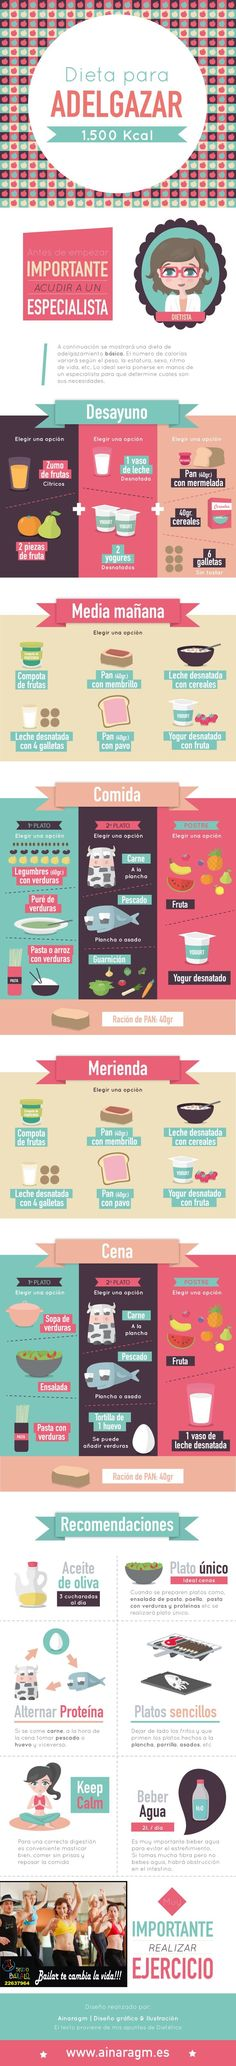 Algunos consejos de Dietas equilibradas